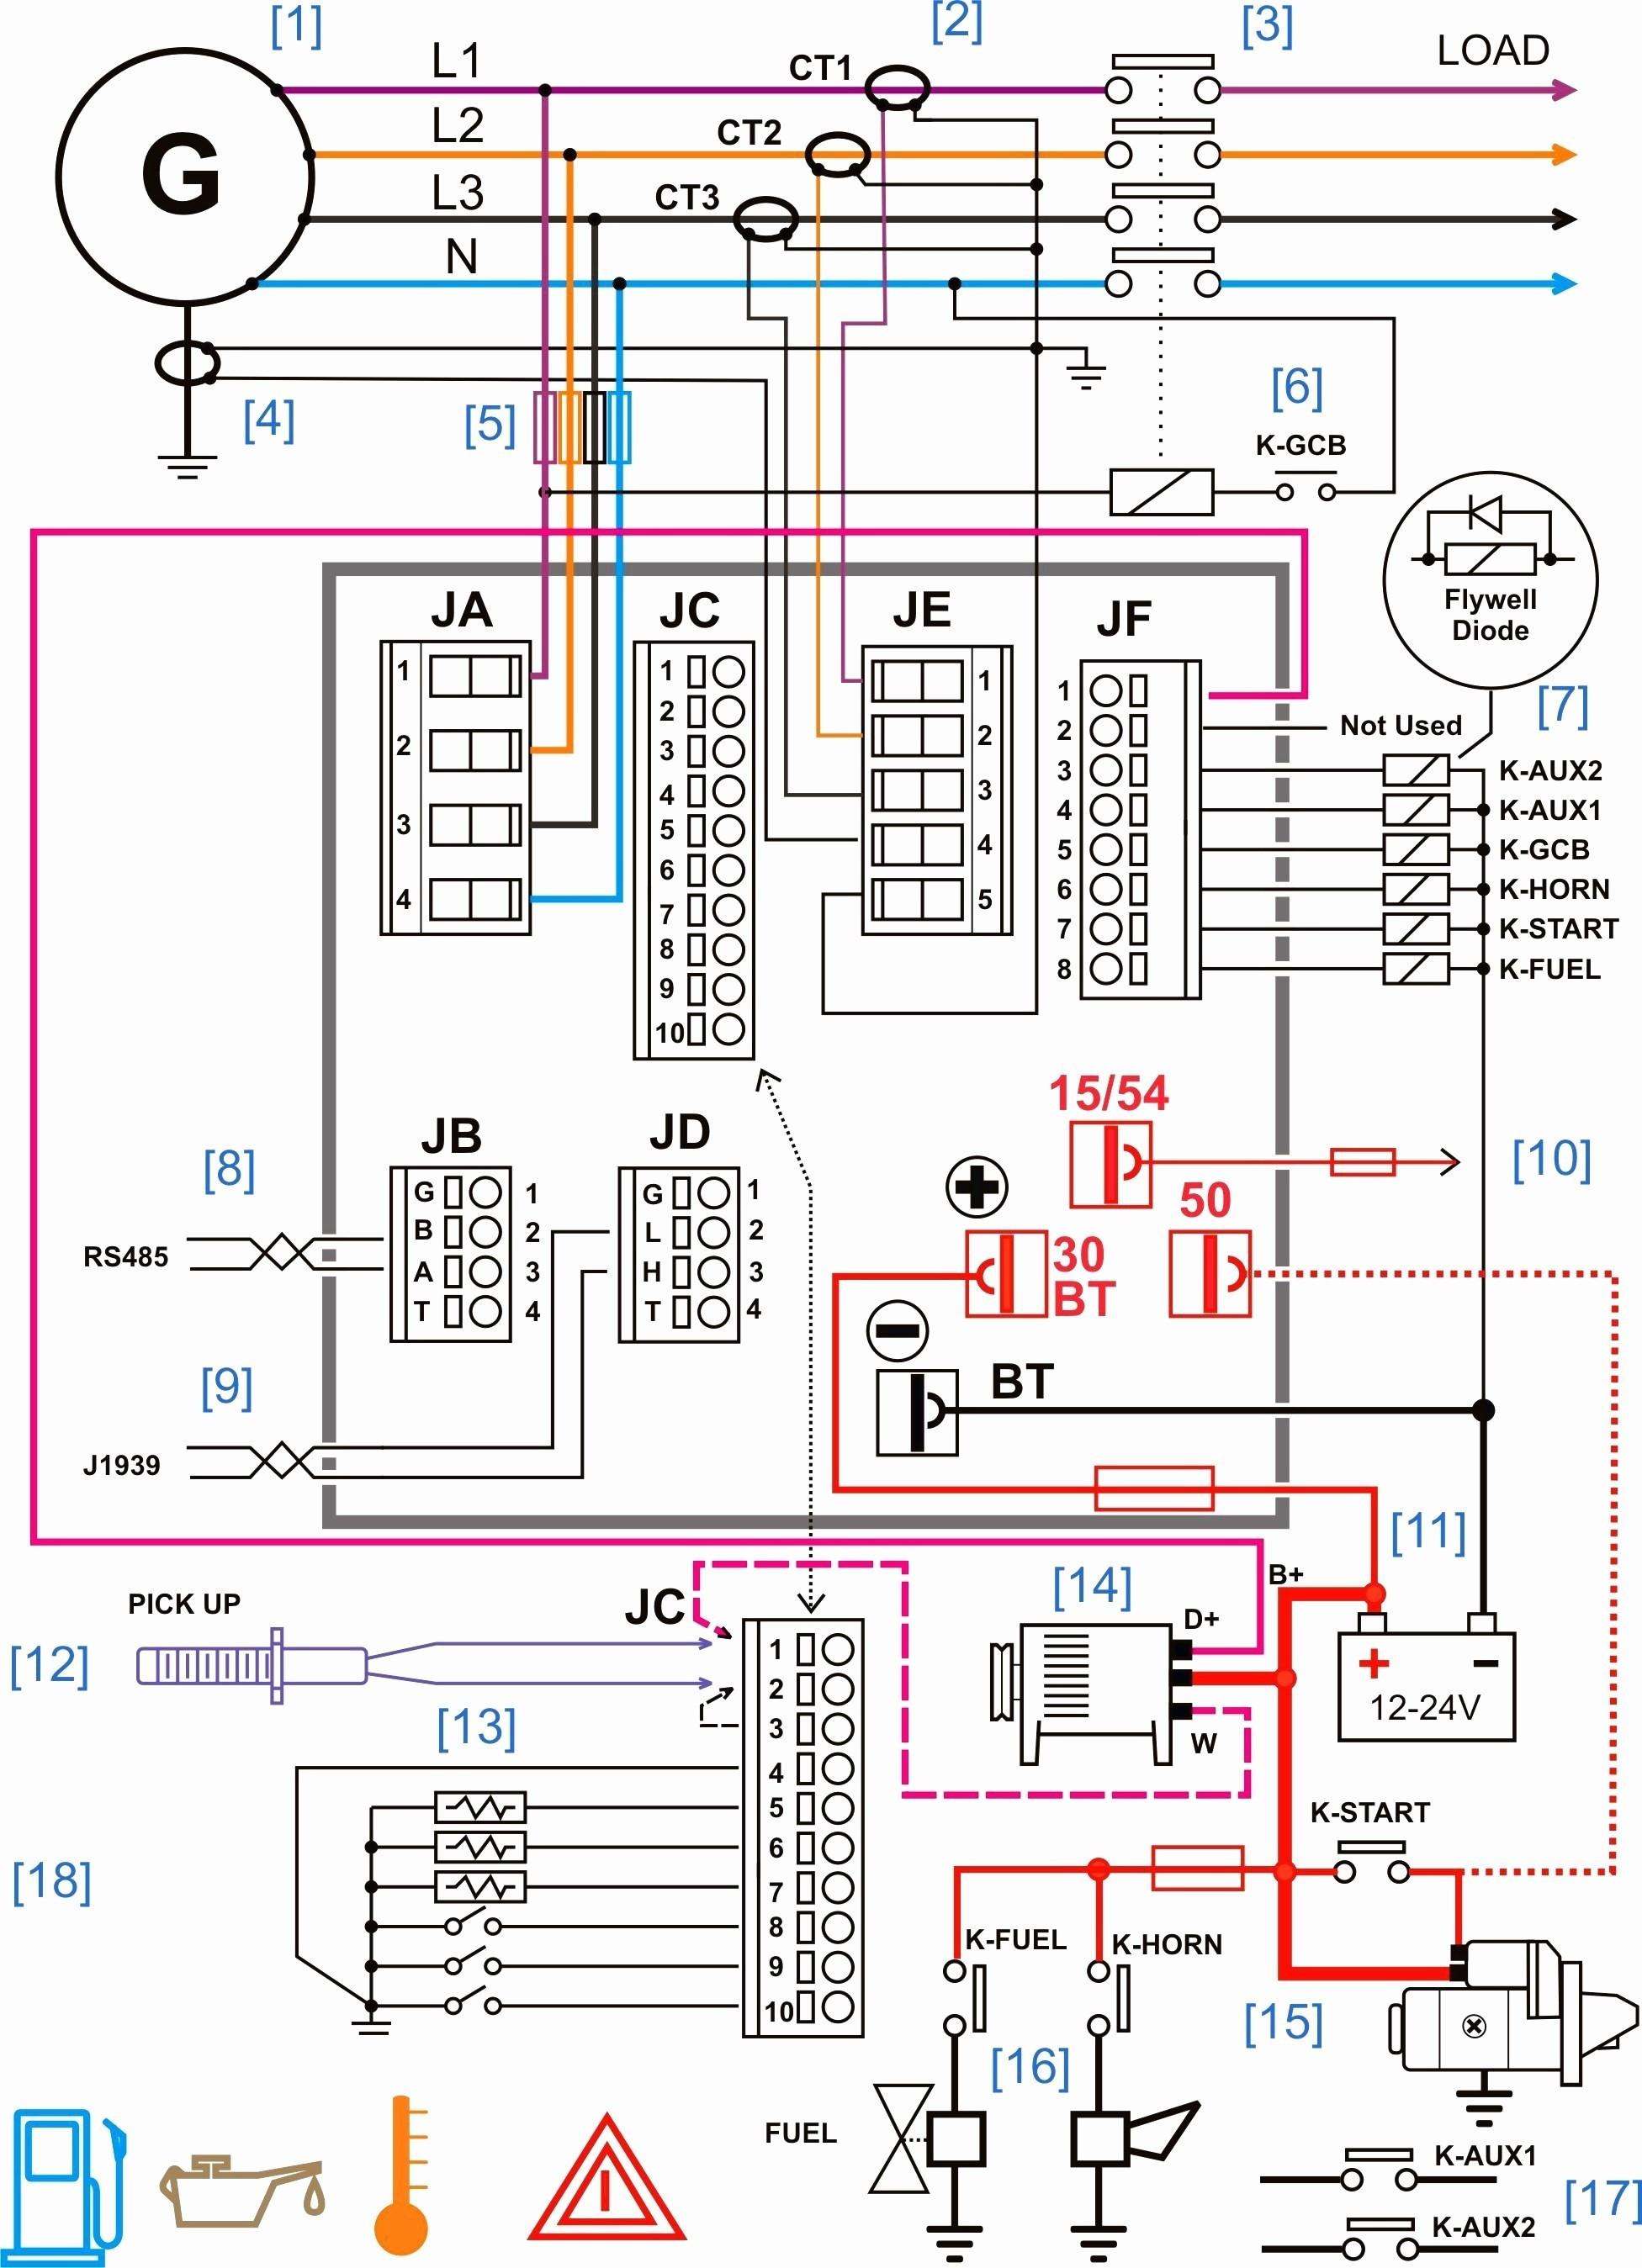 Onan Generator Wire Diagram Block Diagram House Wiring Recent Automotive Wiring Diagram Line Of Onan Generator Wire Diagram